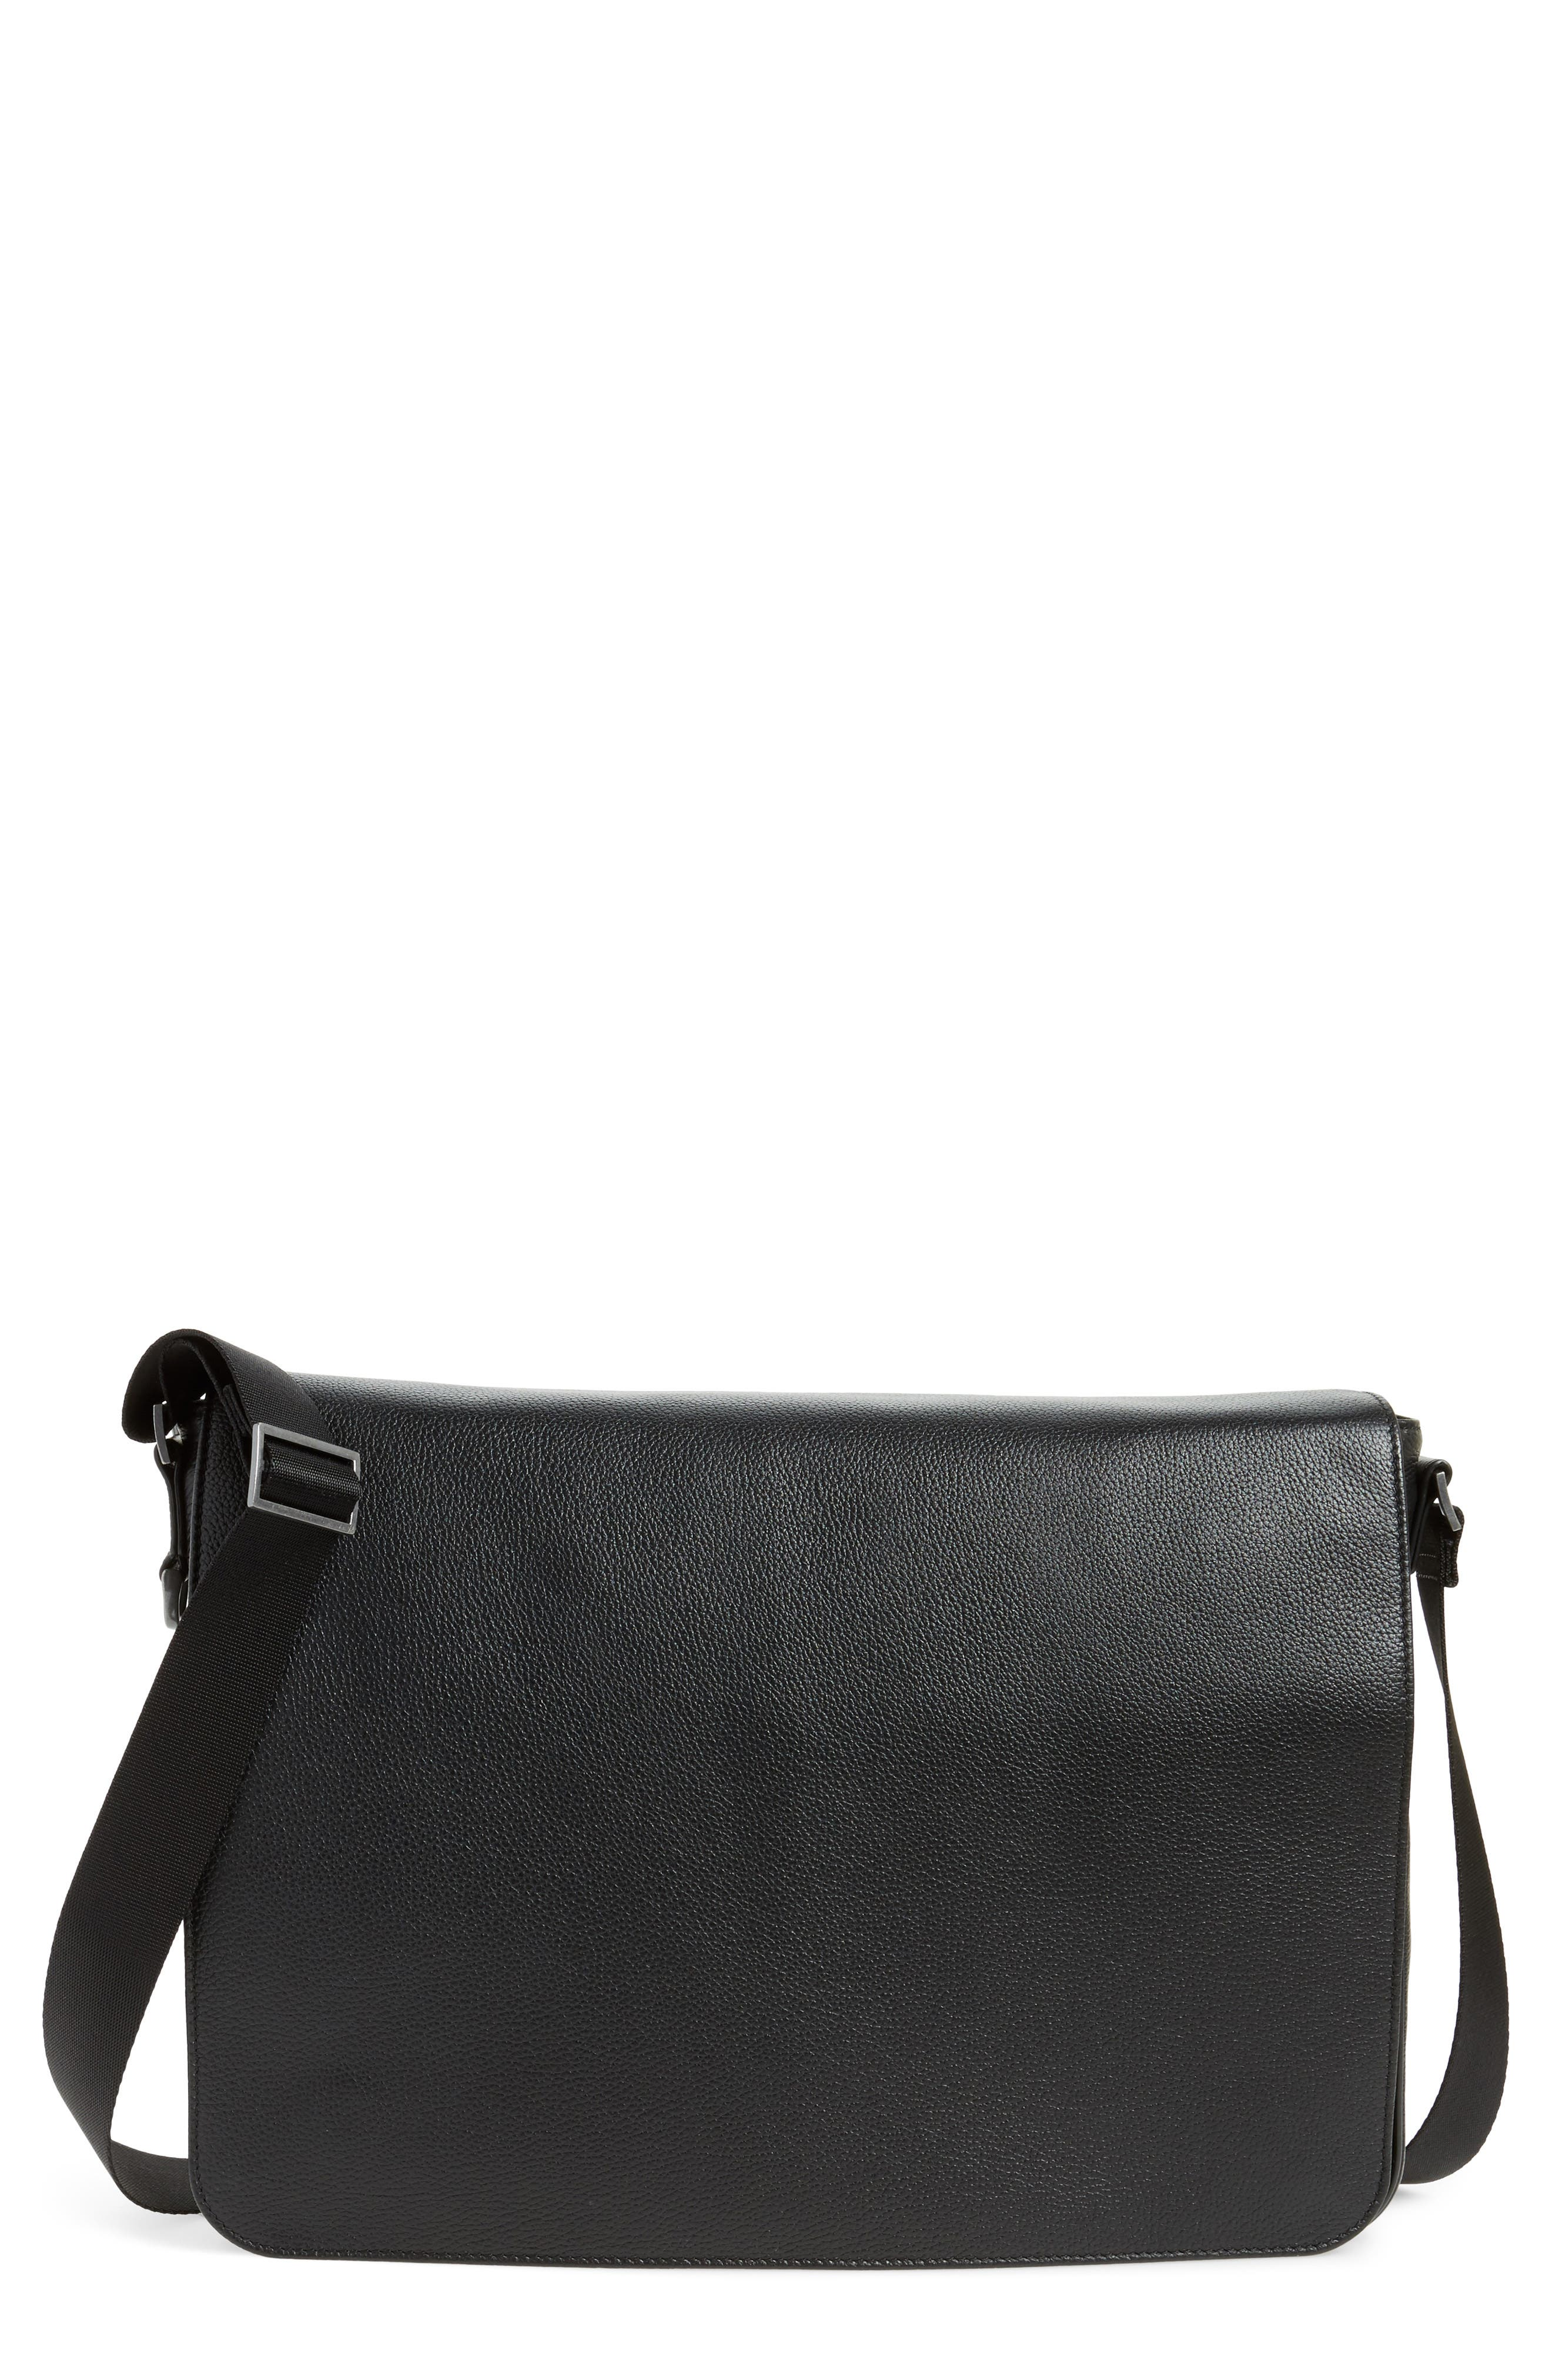 Midland Leather Messenger Bag,                             Main thumbnail 1, color,                             001